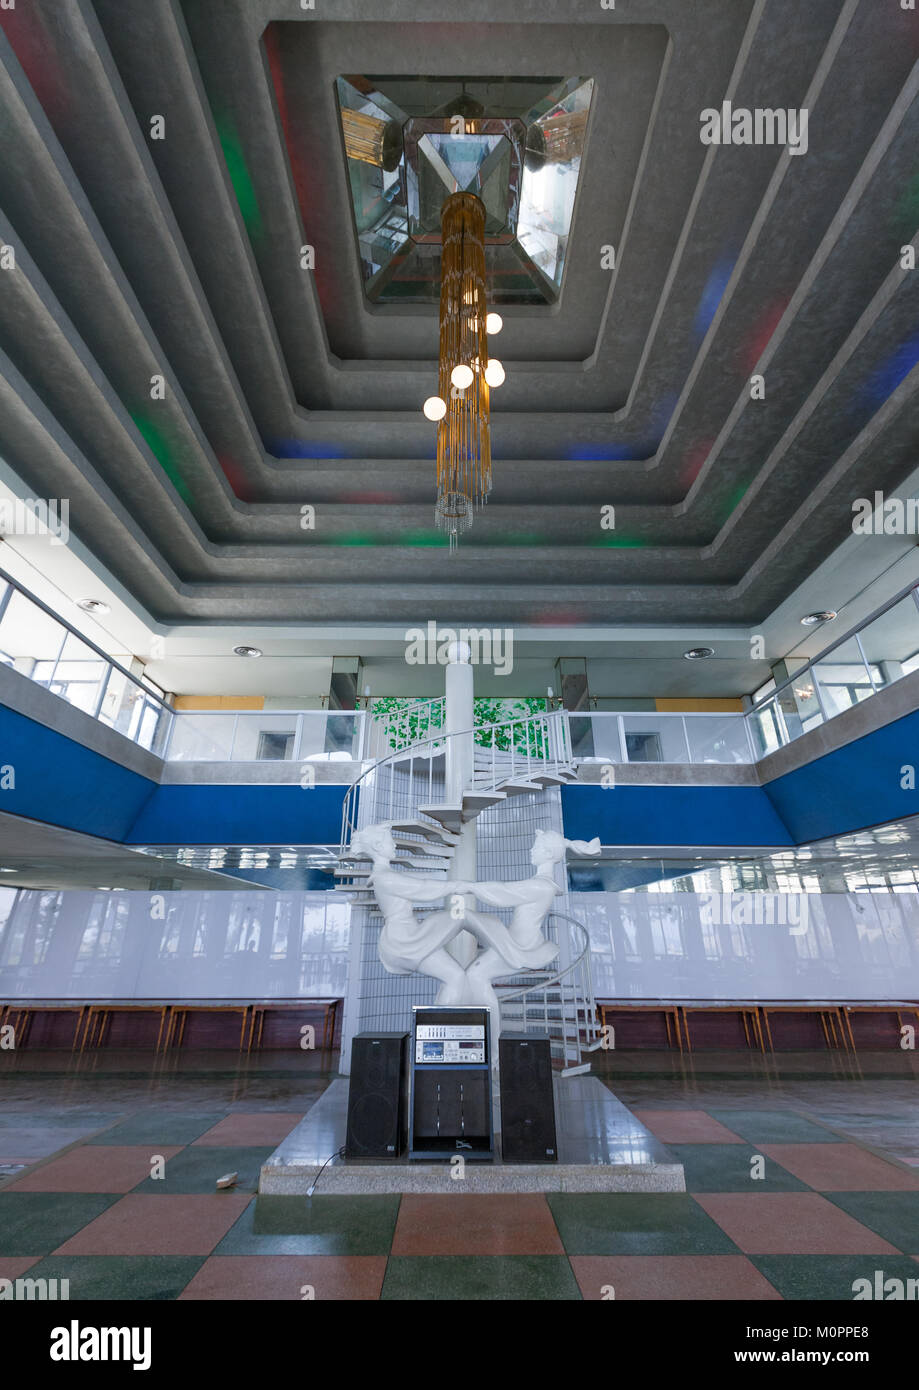 Grand hallway with staircase in Songdowon international children's camp, Kangwon Province, Wonsan, North Korea Stock Photo